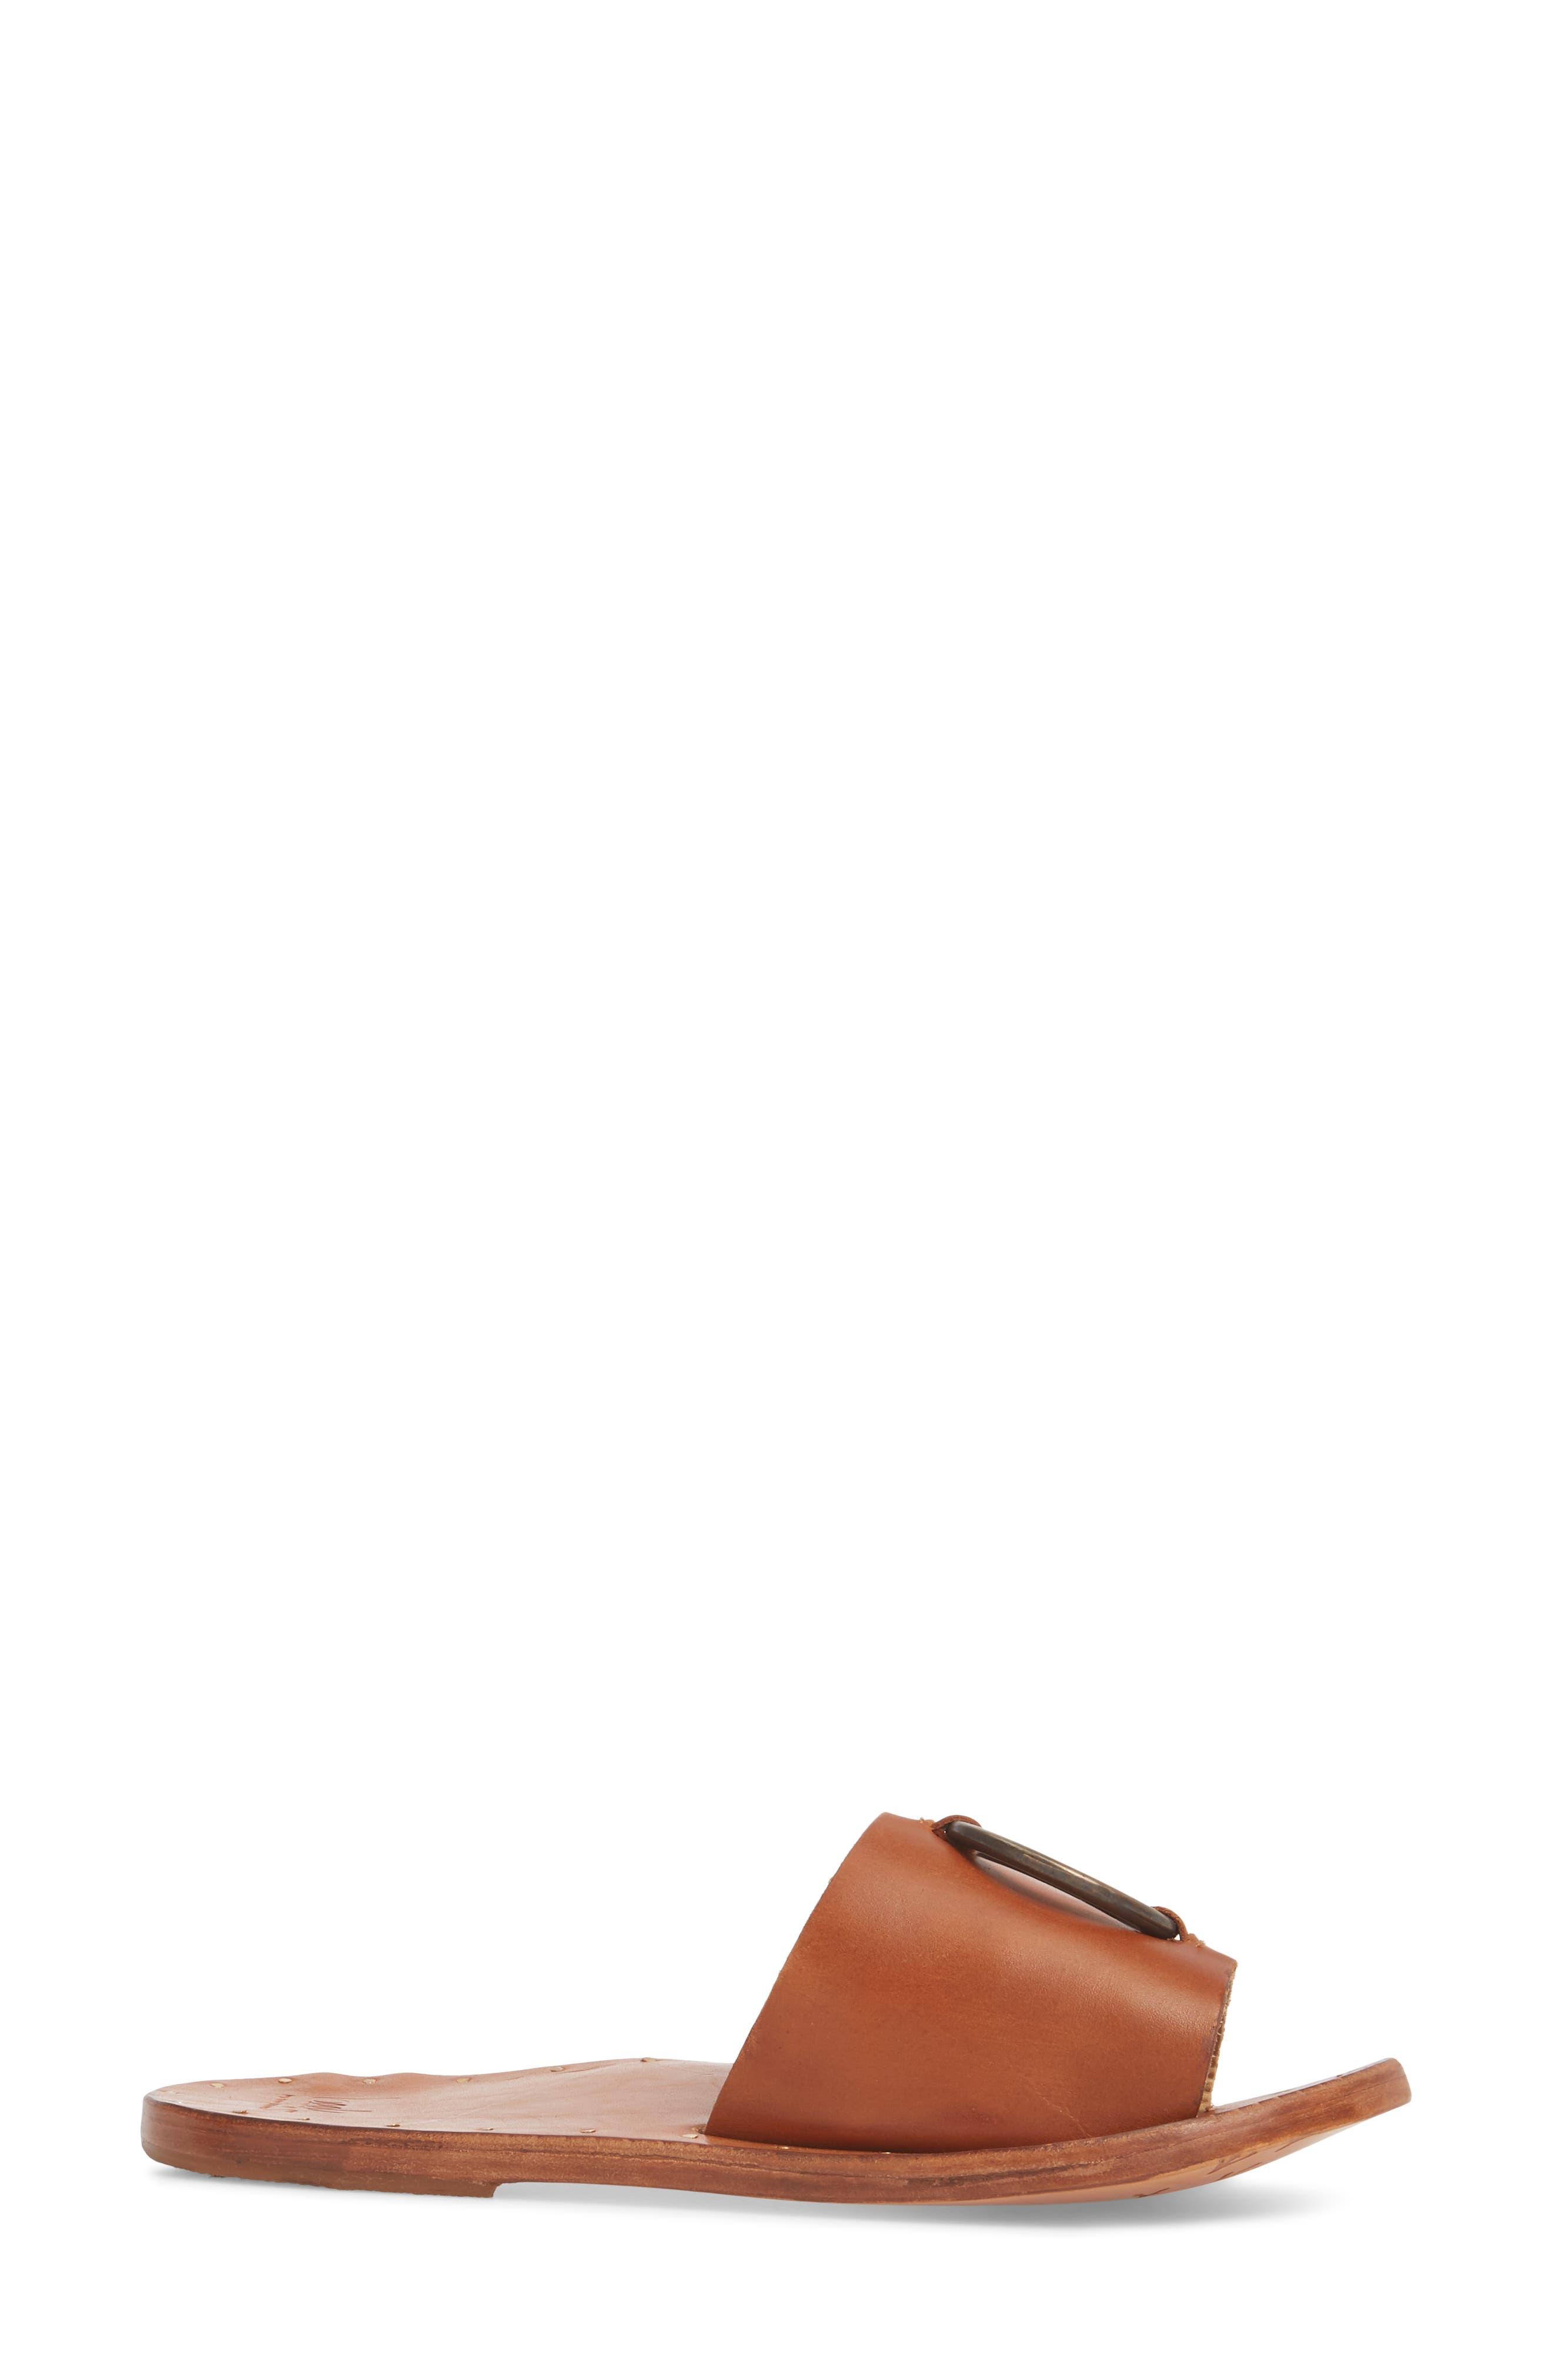 Cockatoo Slide Sandal,                             Alternate thumbnail 3, color,                             Tan/ Tan